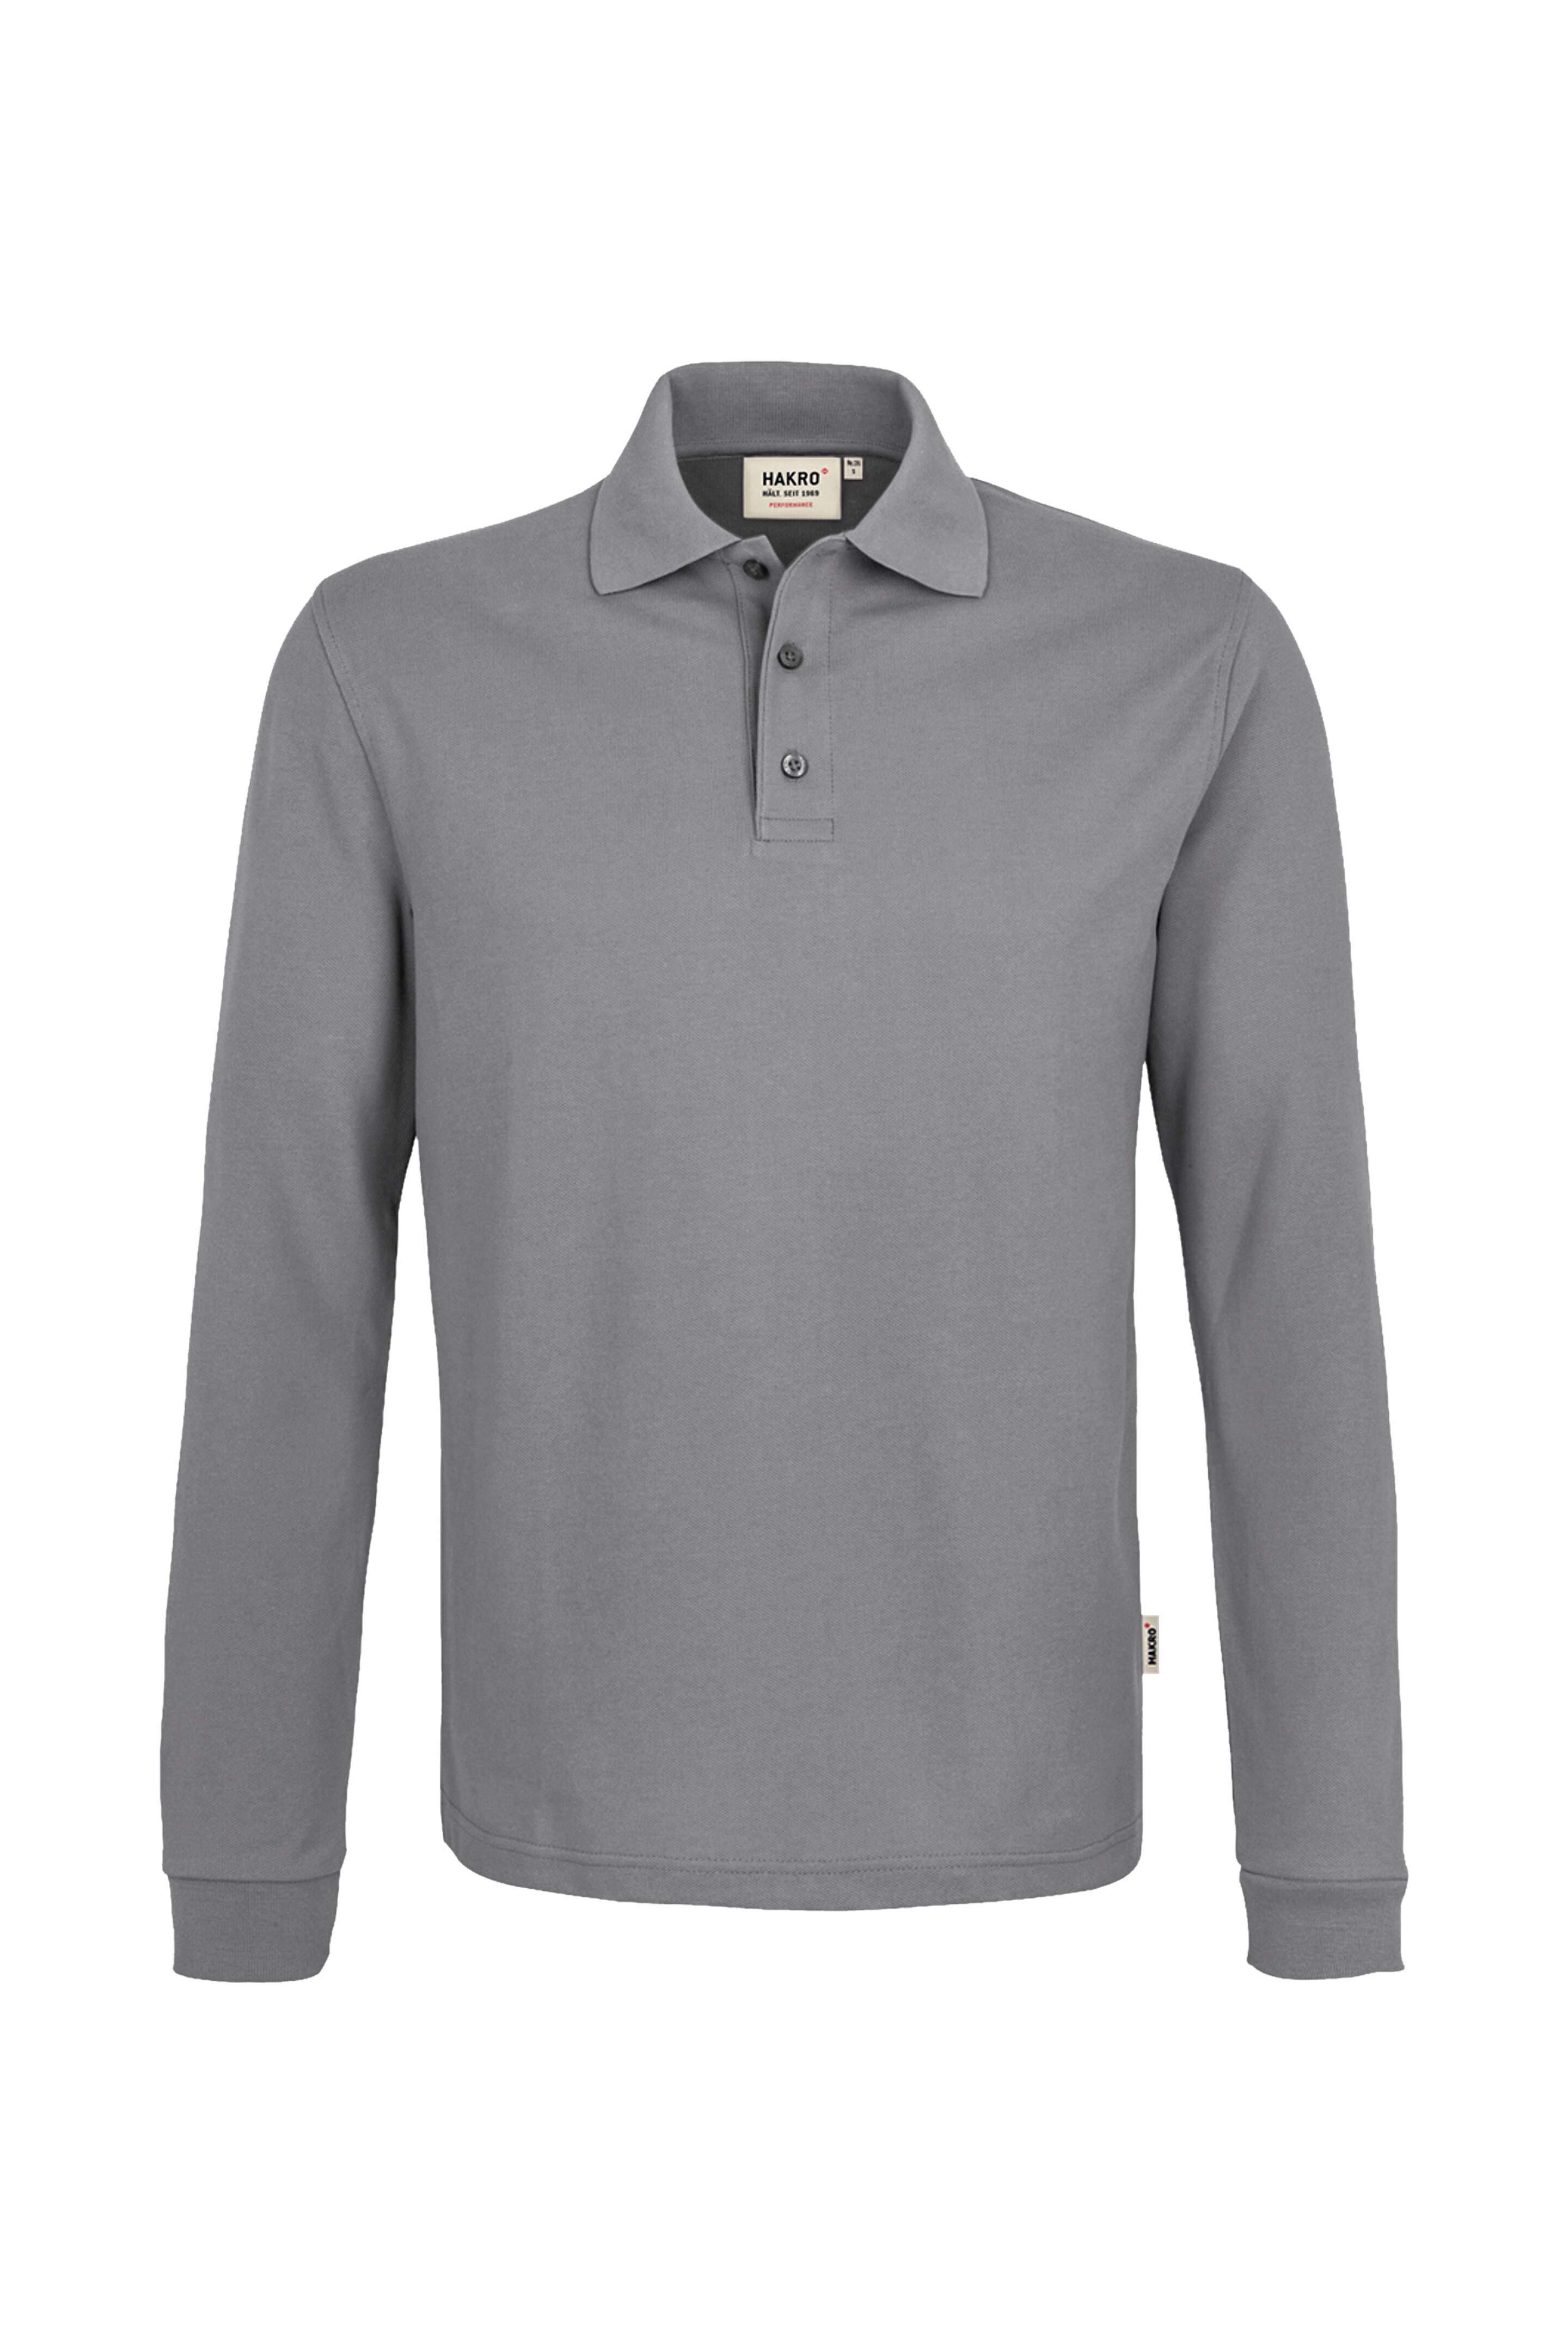 NO. 815 HAKRO Longsleeve-Poloshirt Mikralinar®